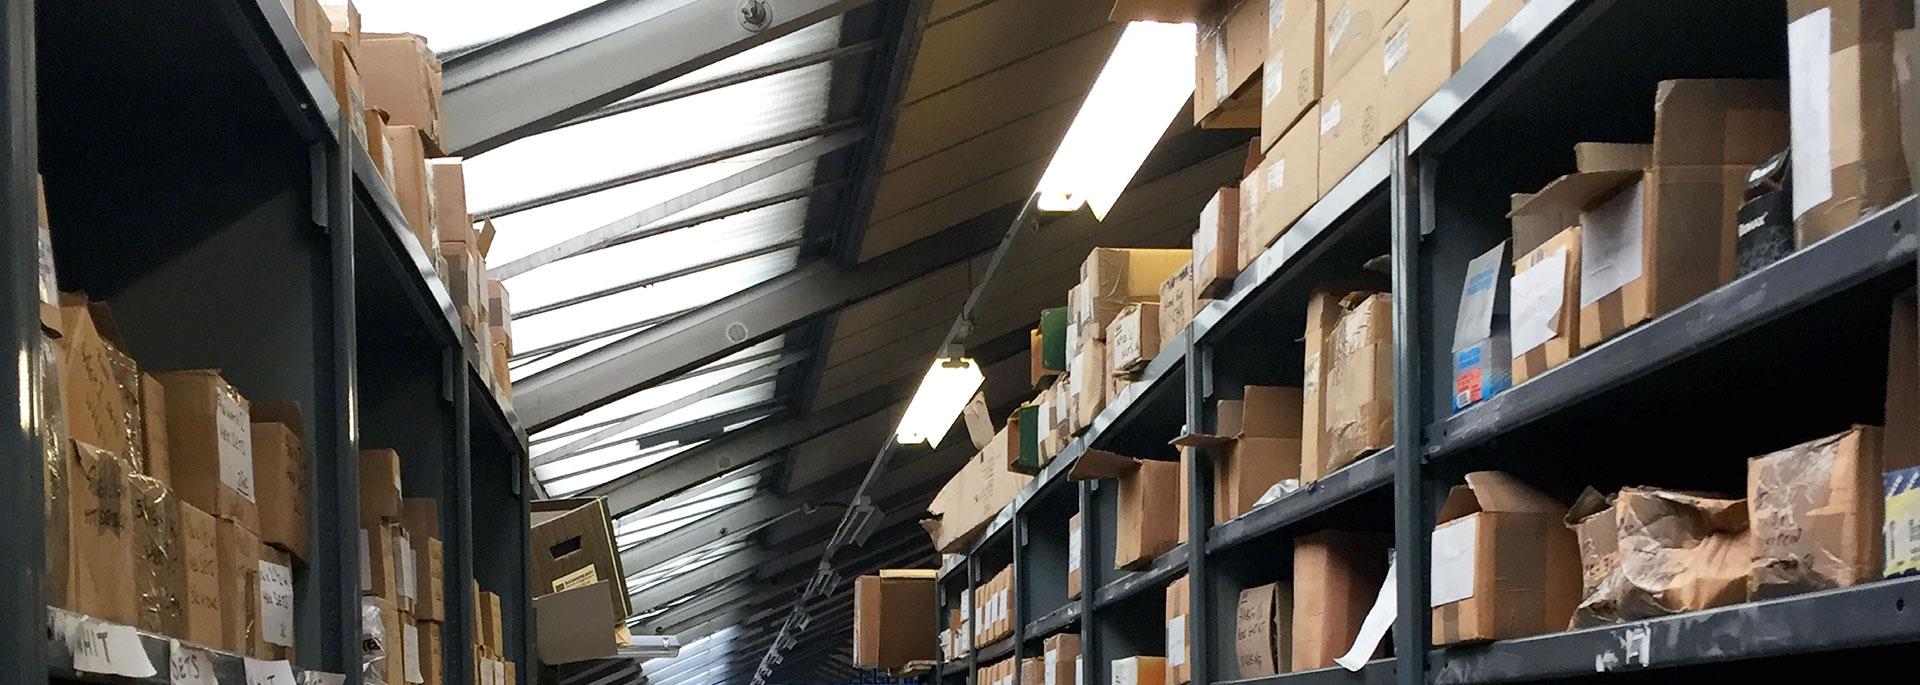 Airius LED Lighting Tri Proof Light 2